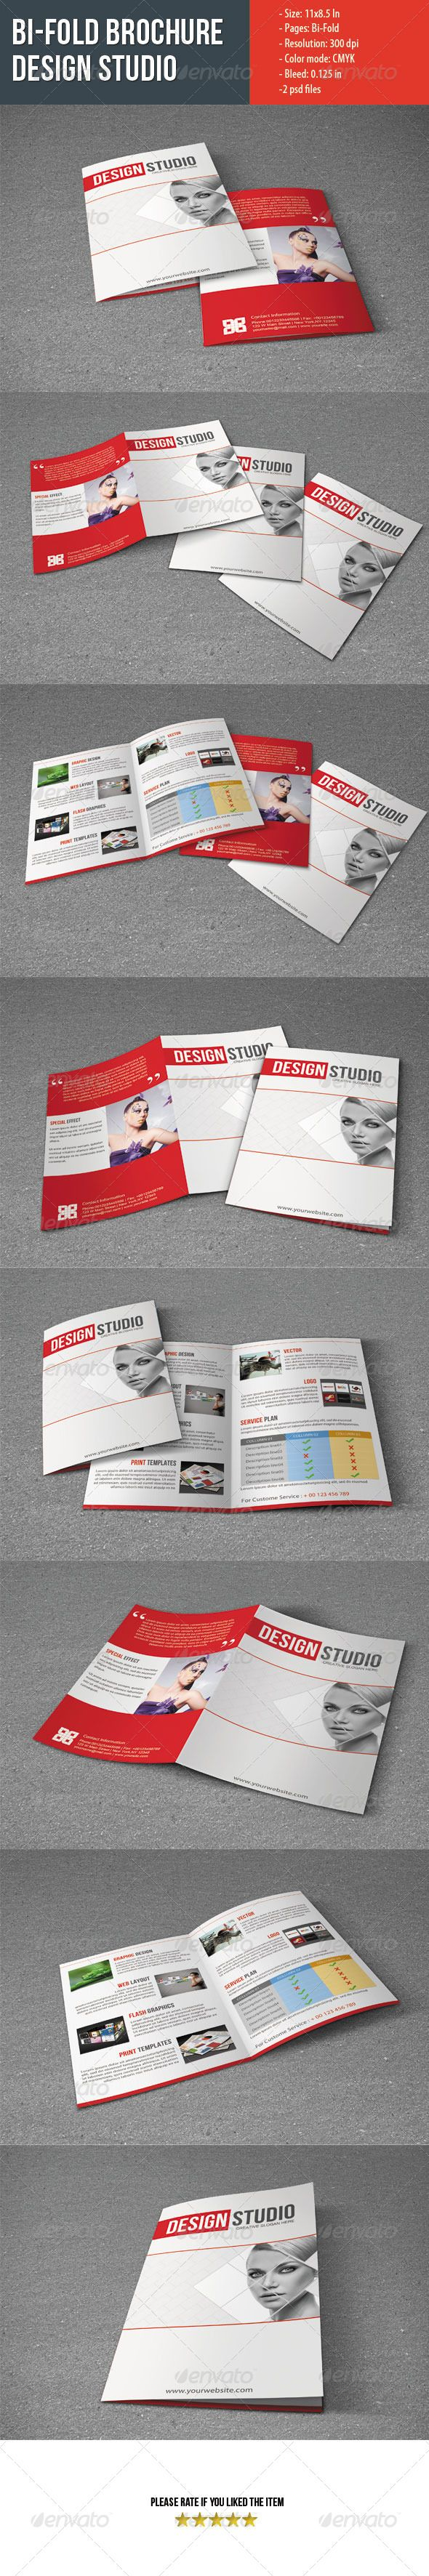 Bifold Brochure For Design Studio